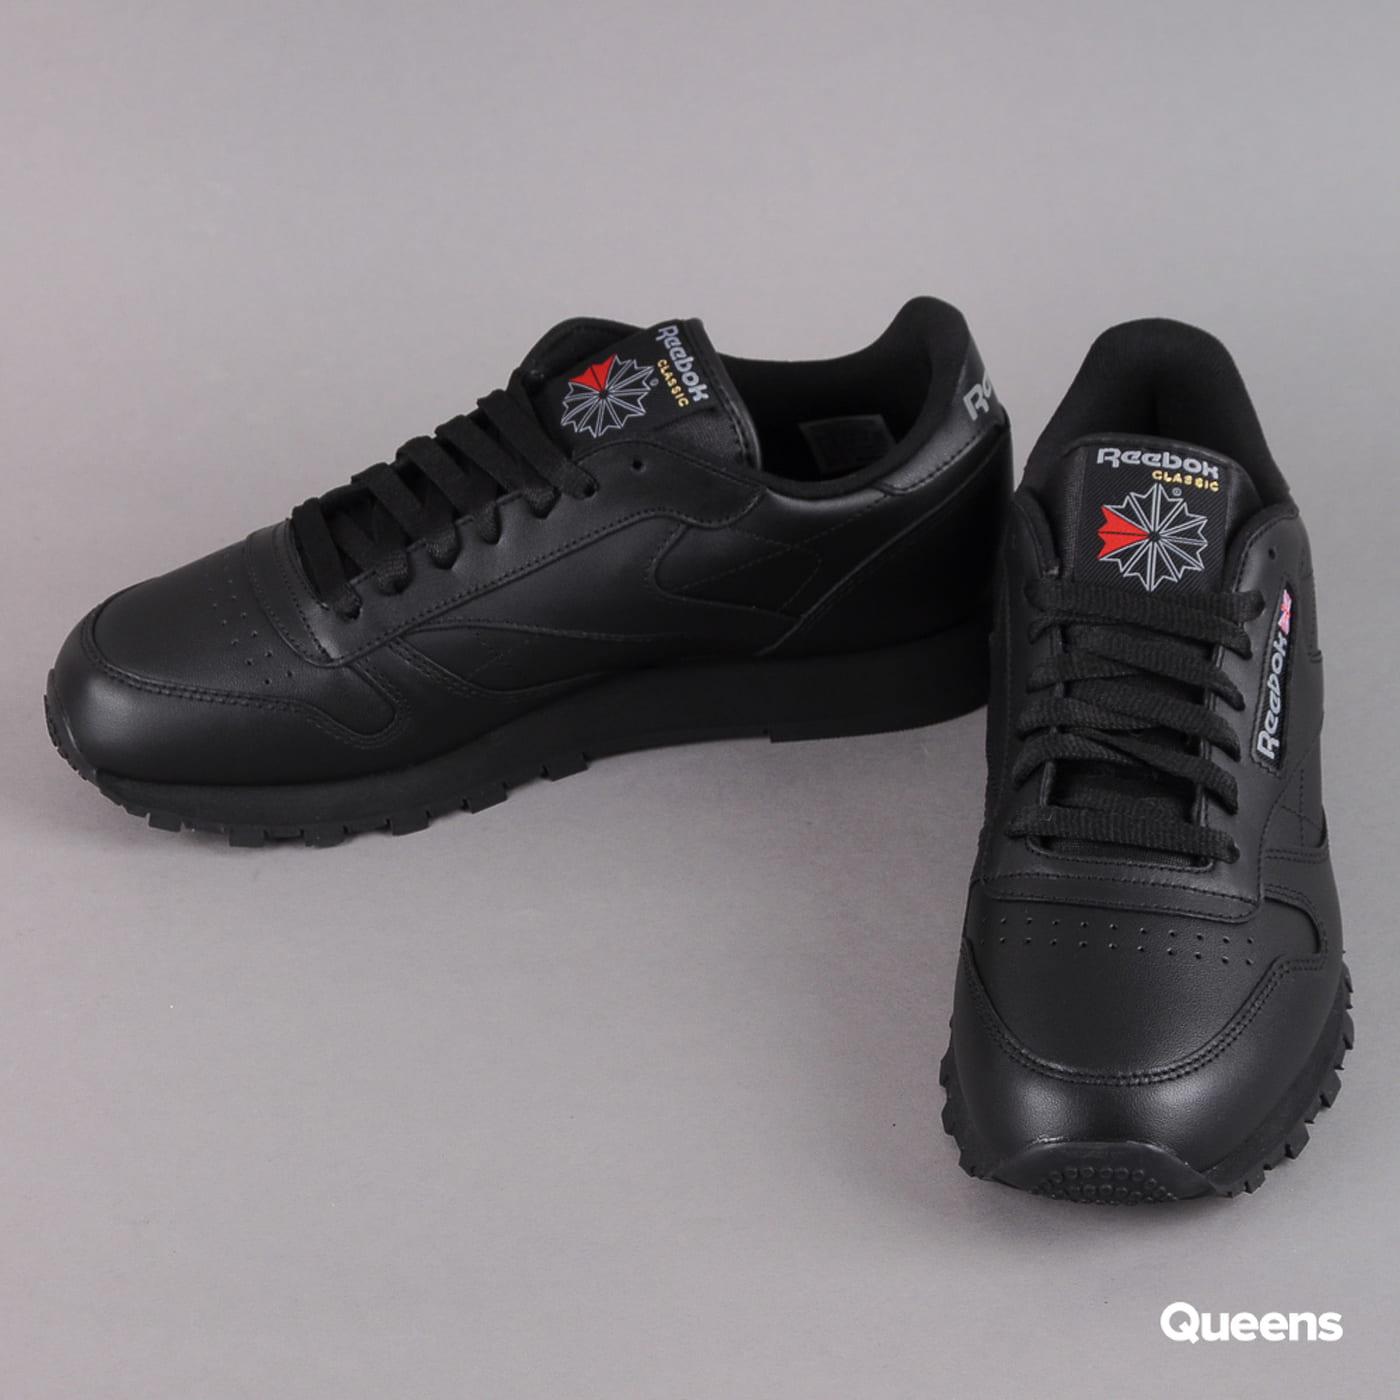 Reebok Classic Leather W black